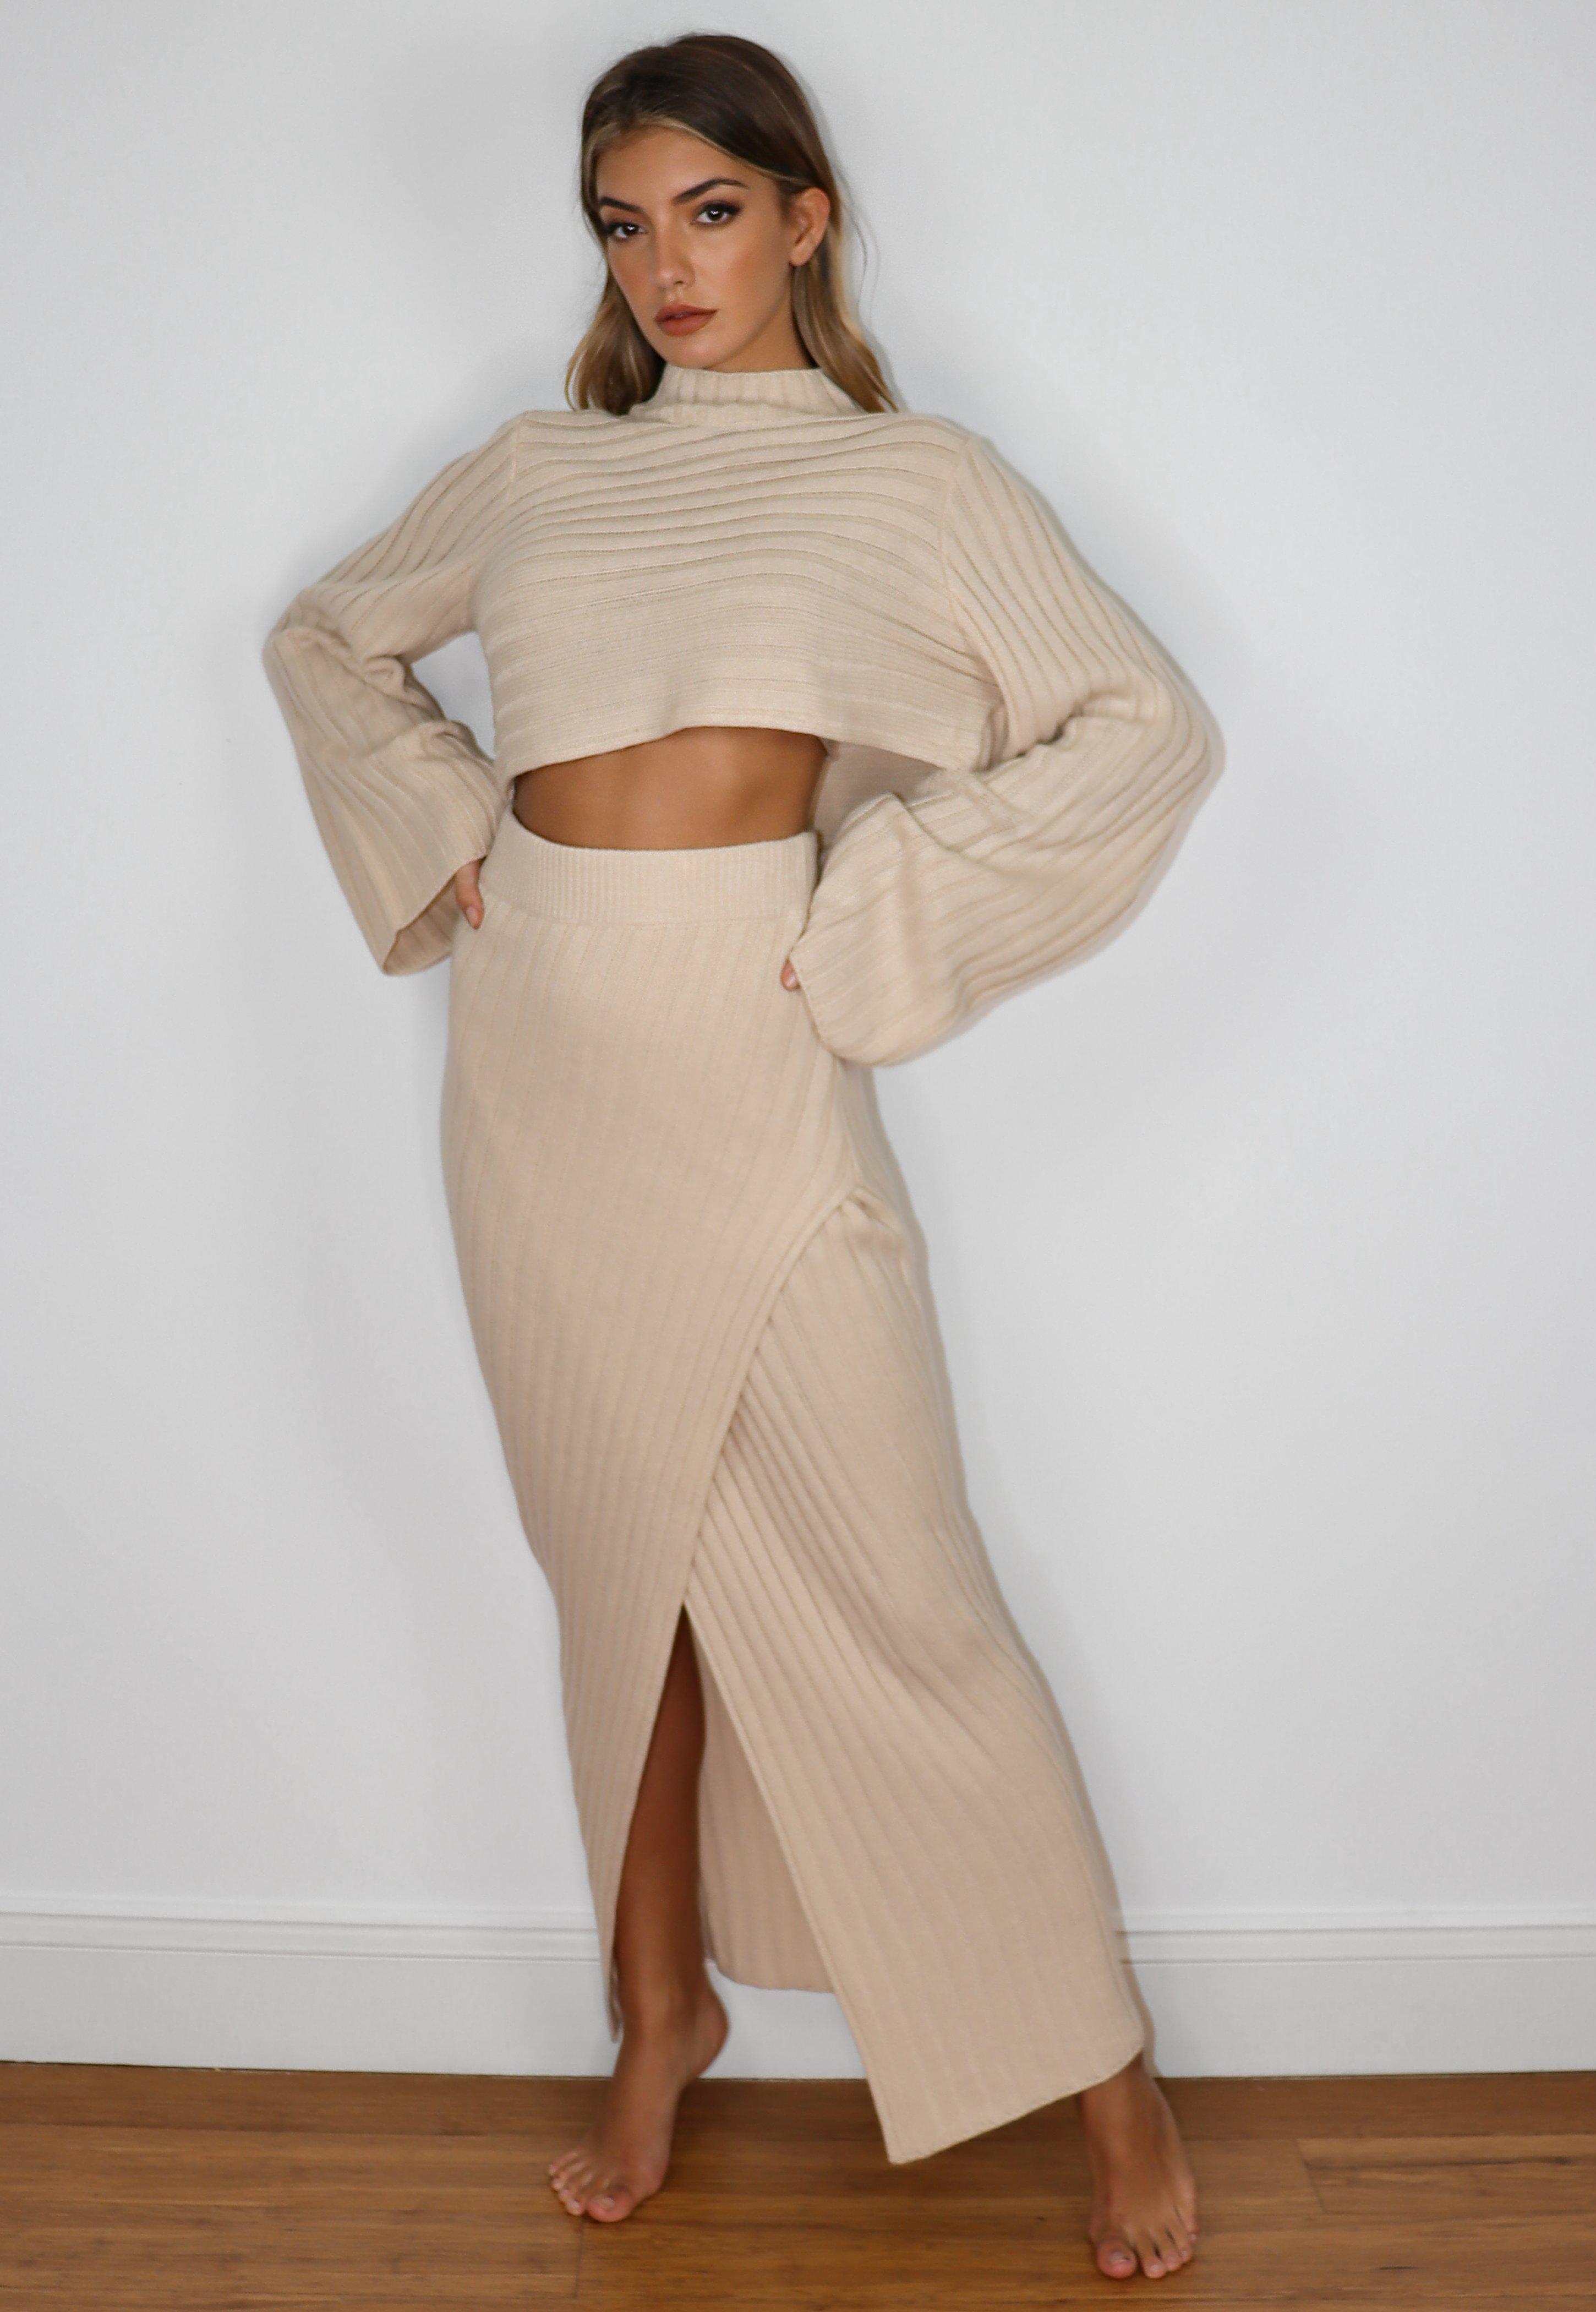 Missguided Asymmetric Hem Wrap Nude Pink Dress Sizes 6-10